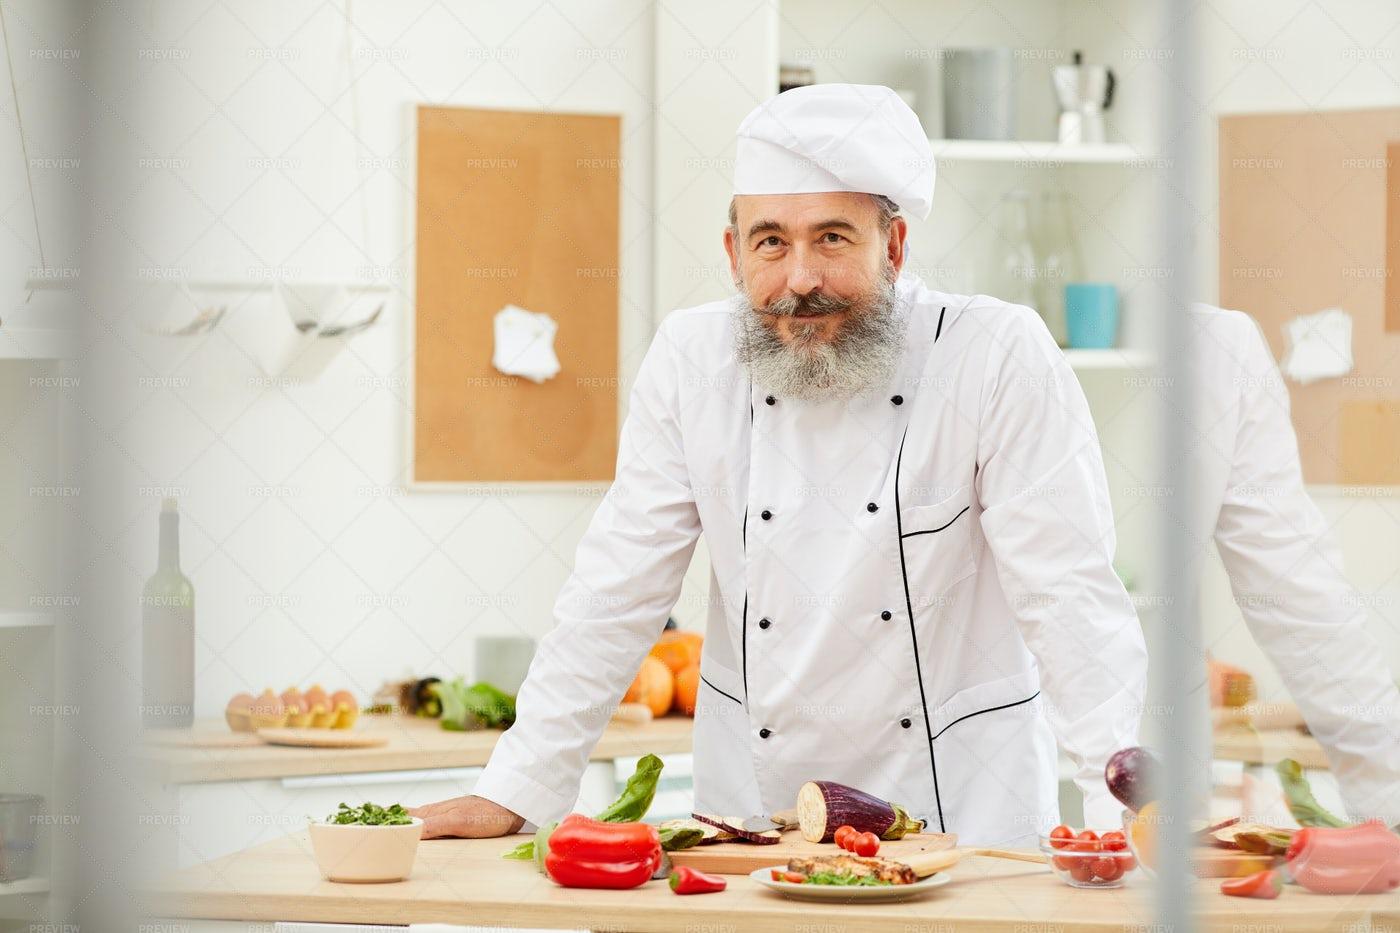 Senior Chef Posing In Kitchen: Stock Photos